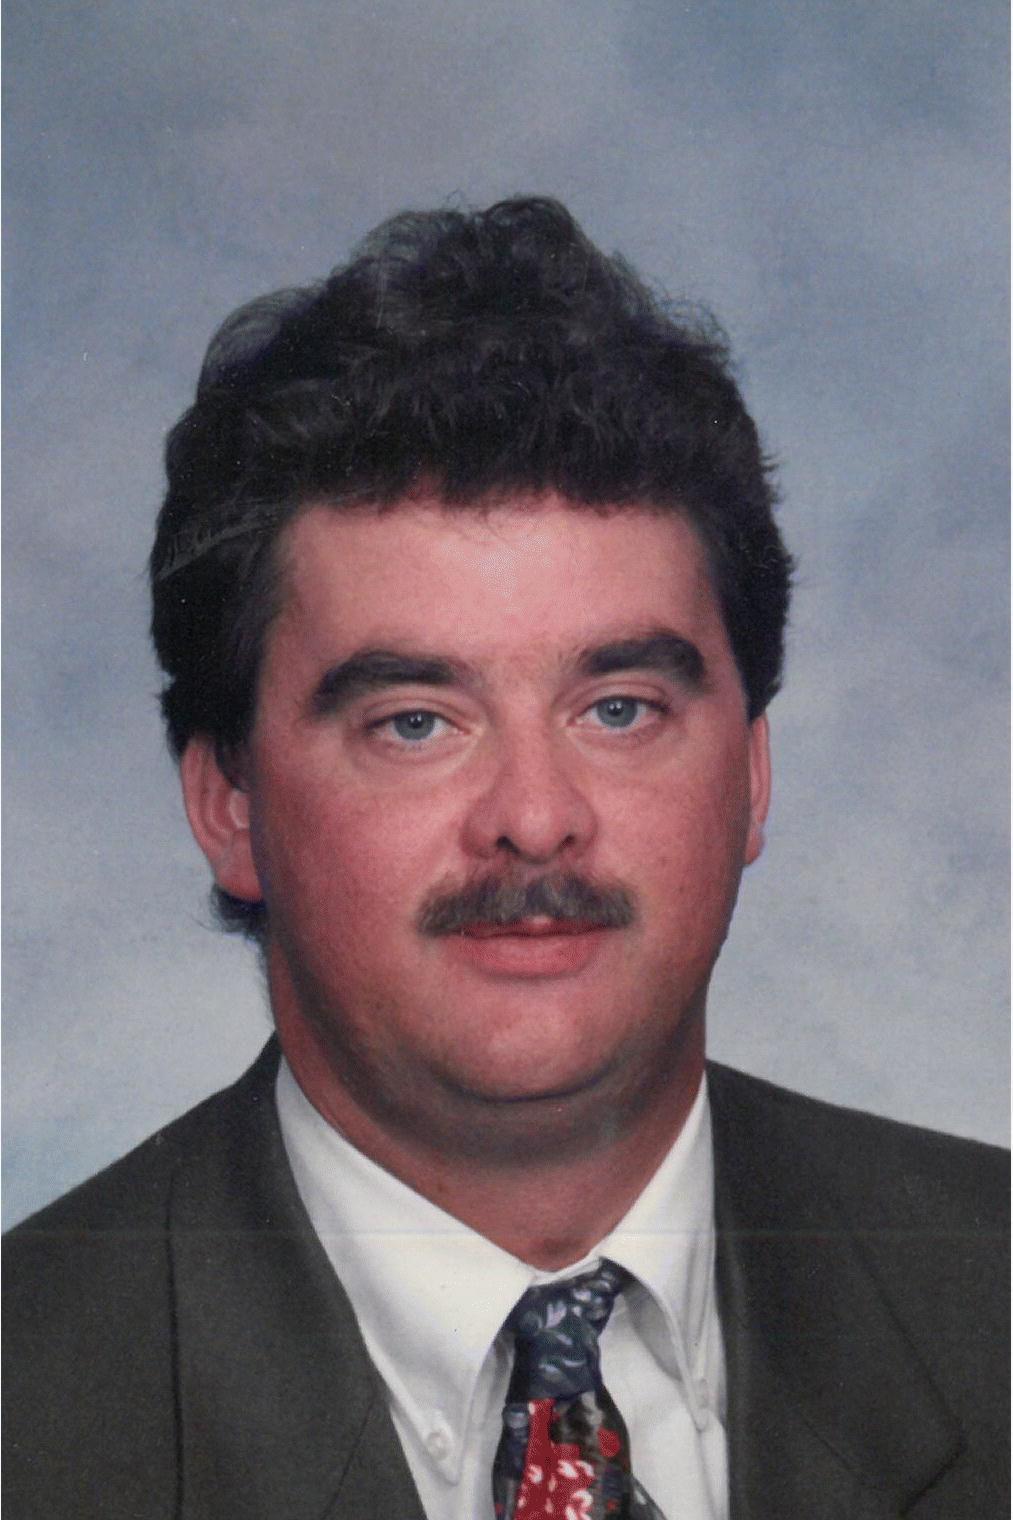 Darryl McLaughlin